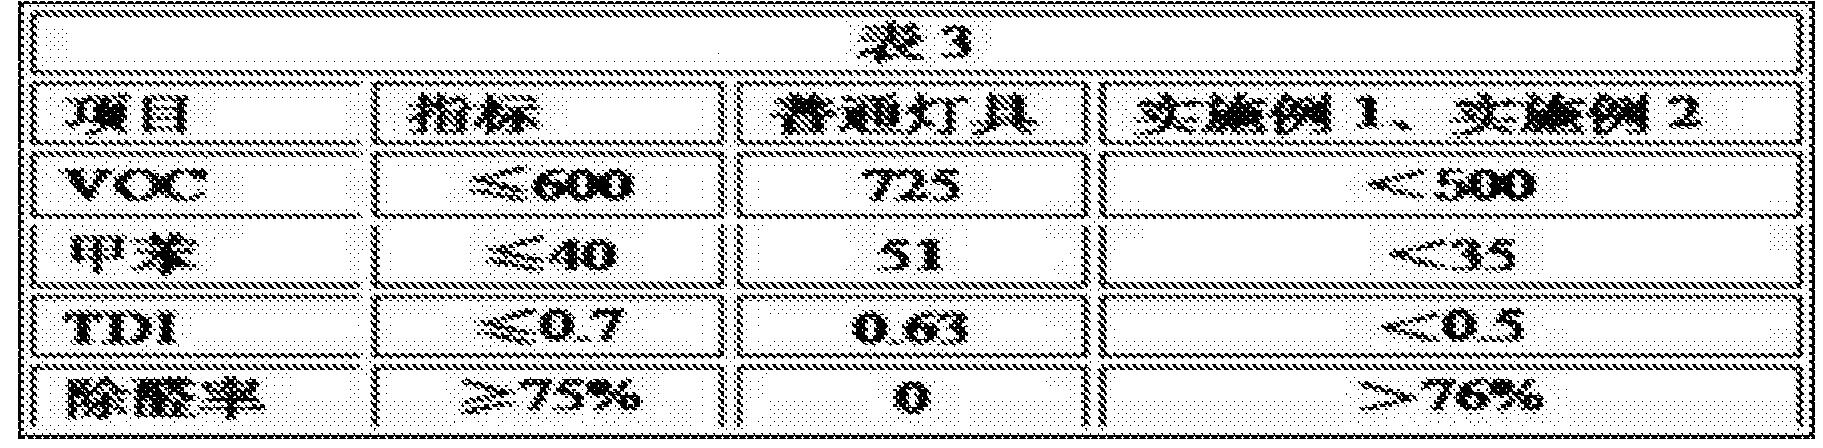 Figure CN106189659AD00123